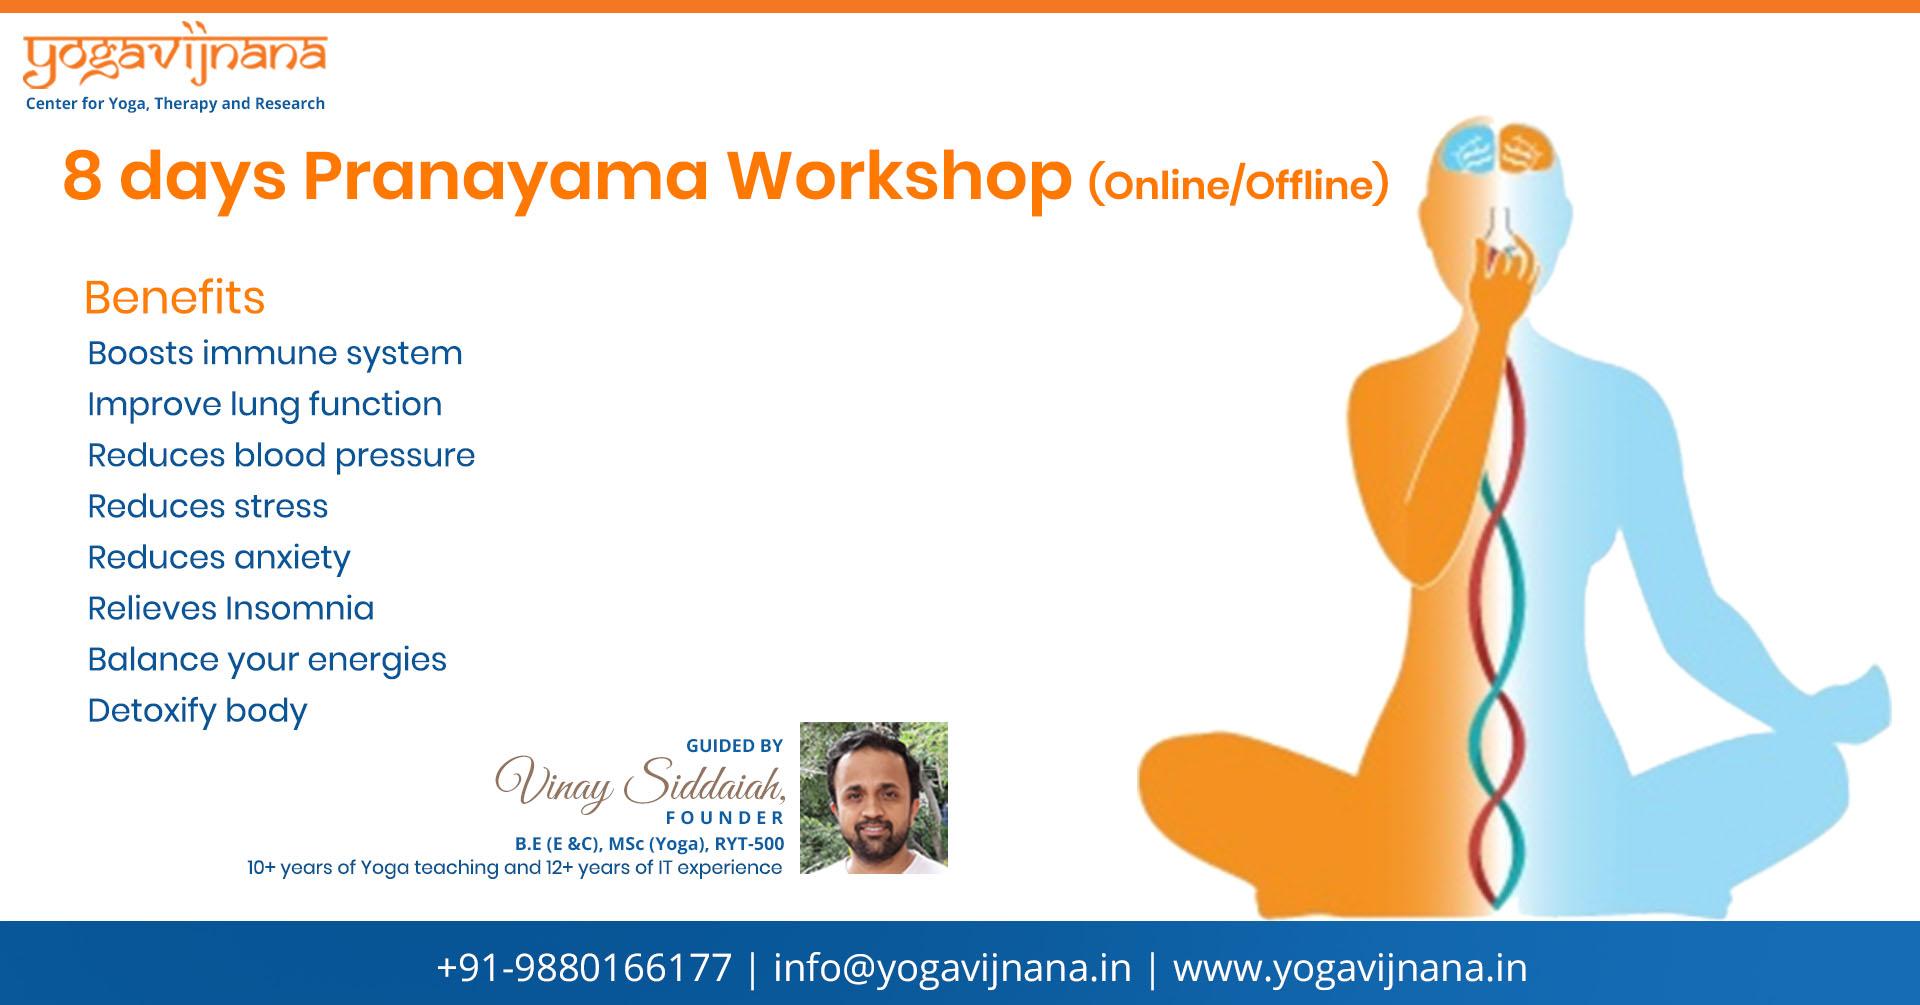 8 days Pranayama Workshop by Vinay Siddaiah